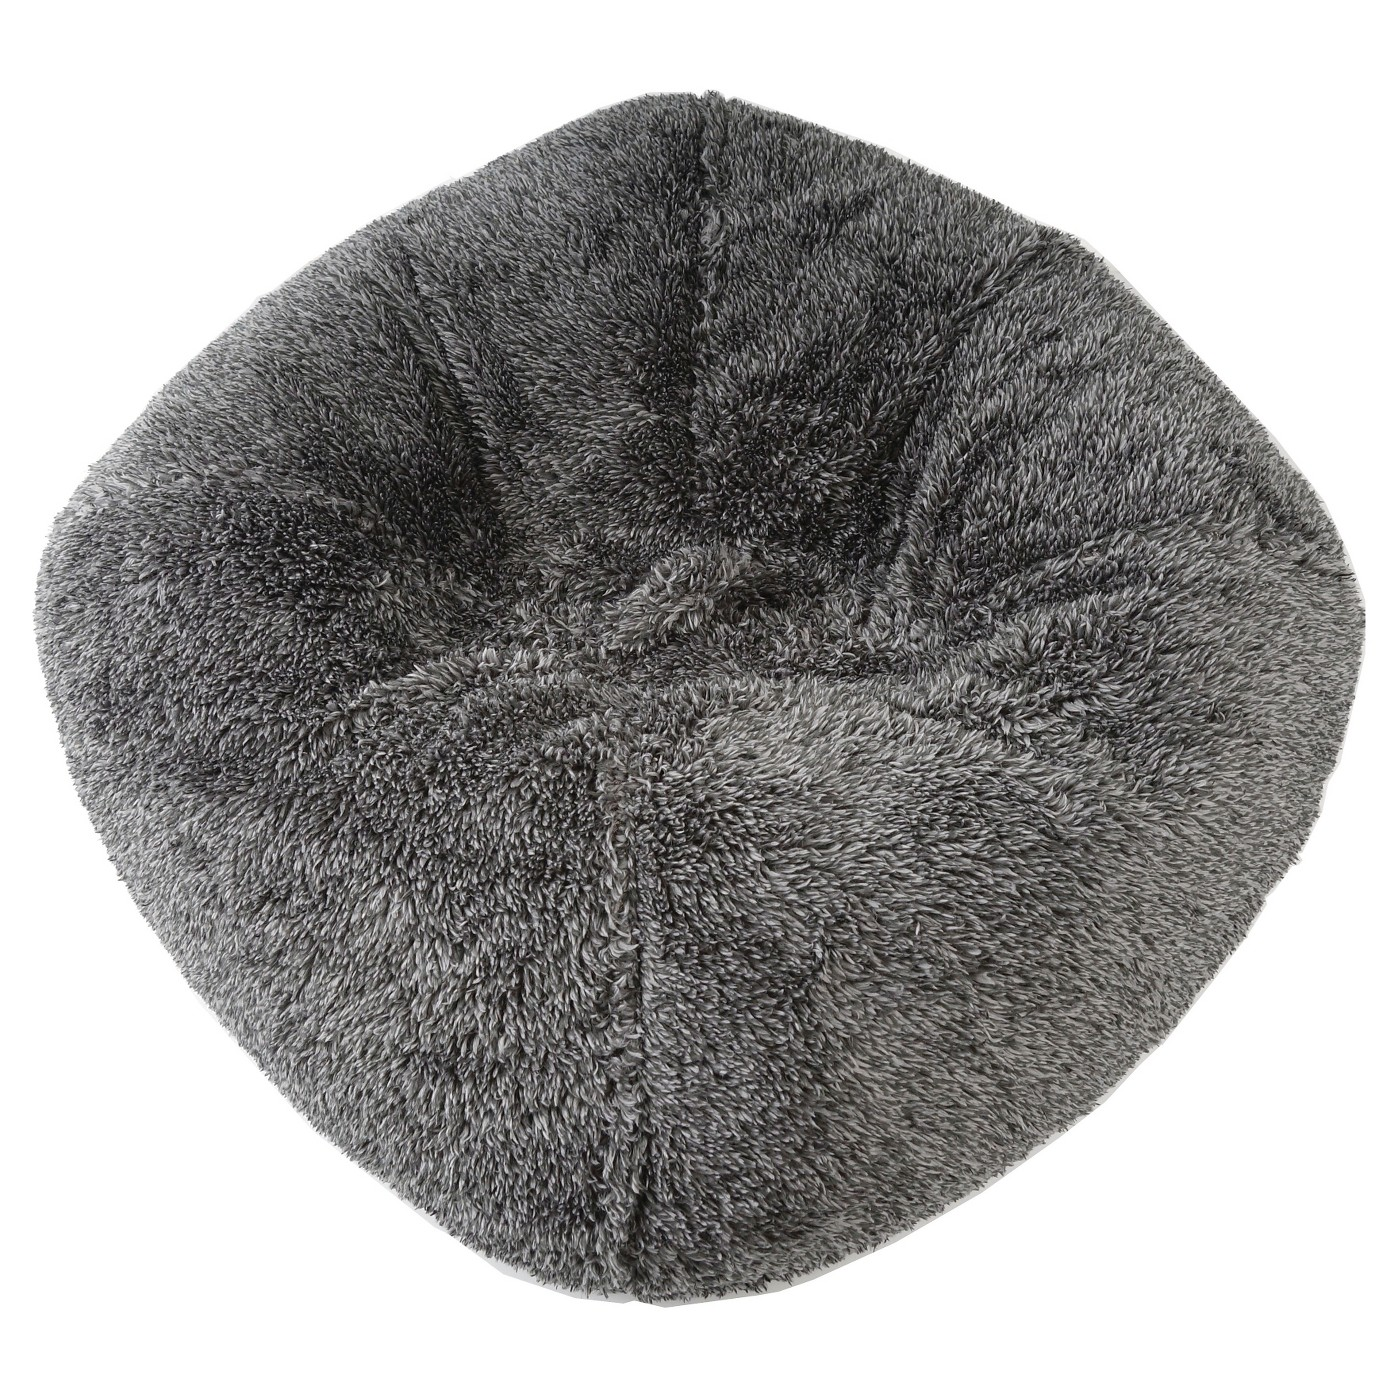 "Fuzzy Bean Bag Chair - Pillowfortâ""¢ - image 1 of 1"